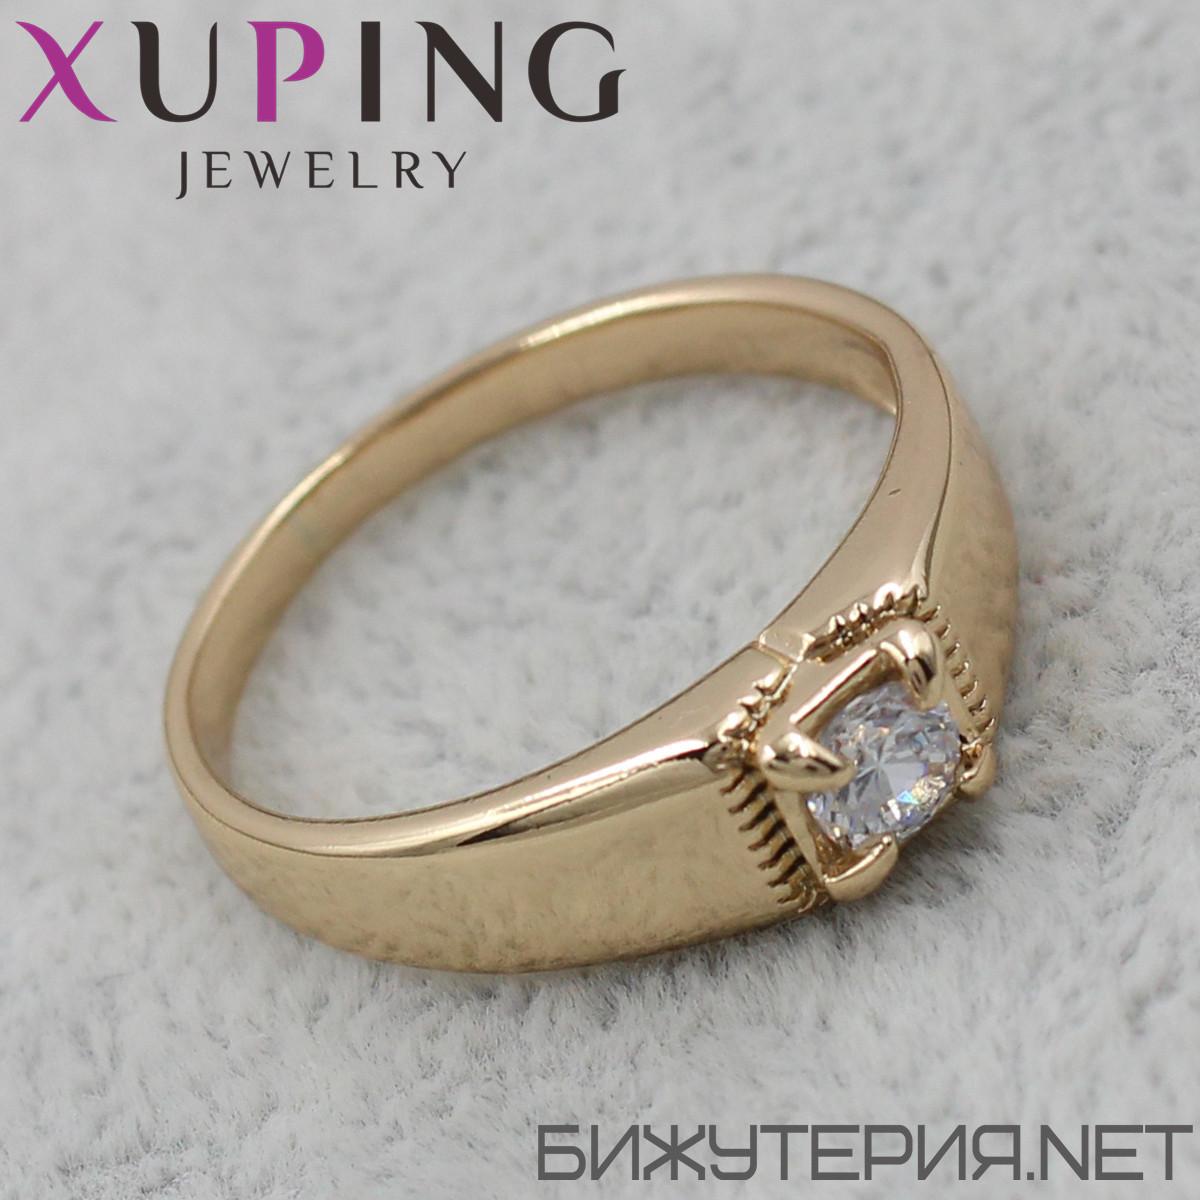 Кольцо Xuping медицинское золото 18K Gold - 1027634335 19